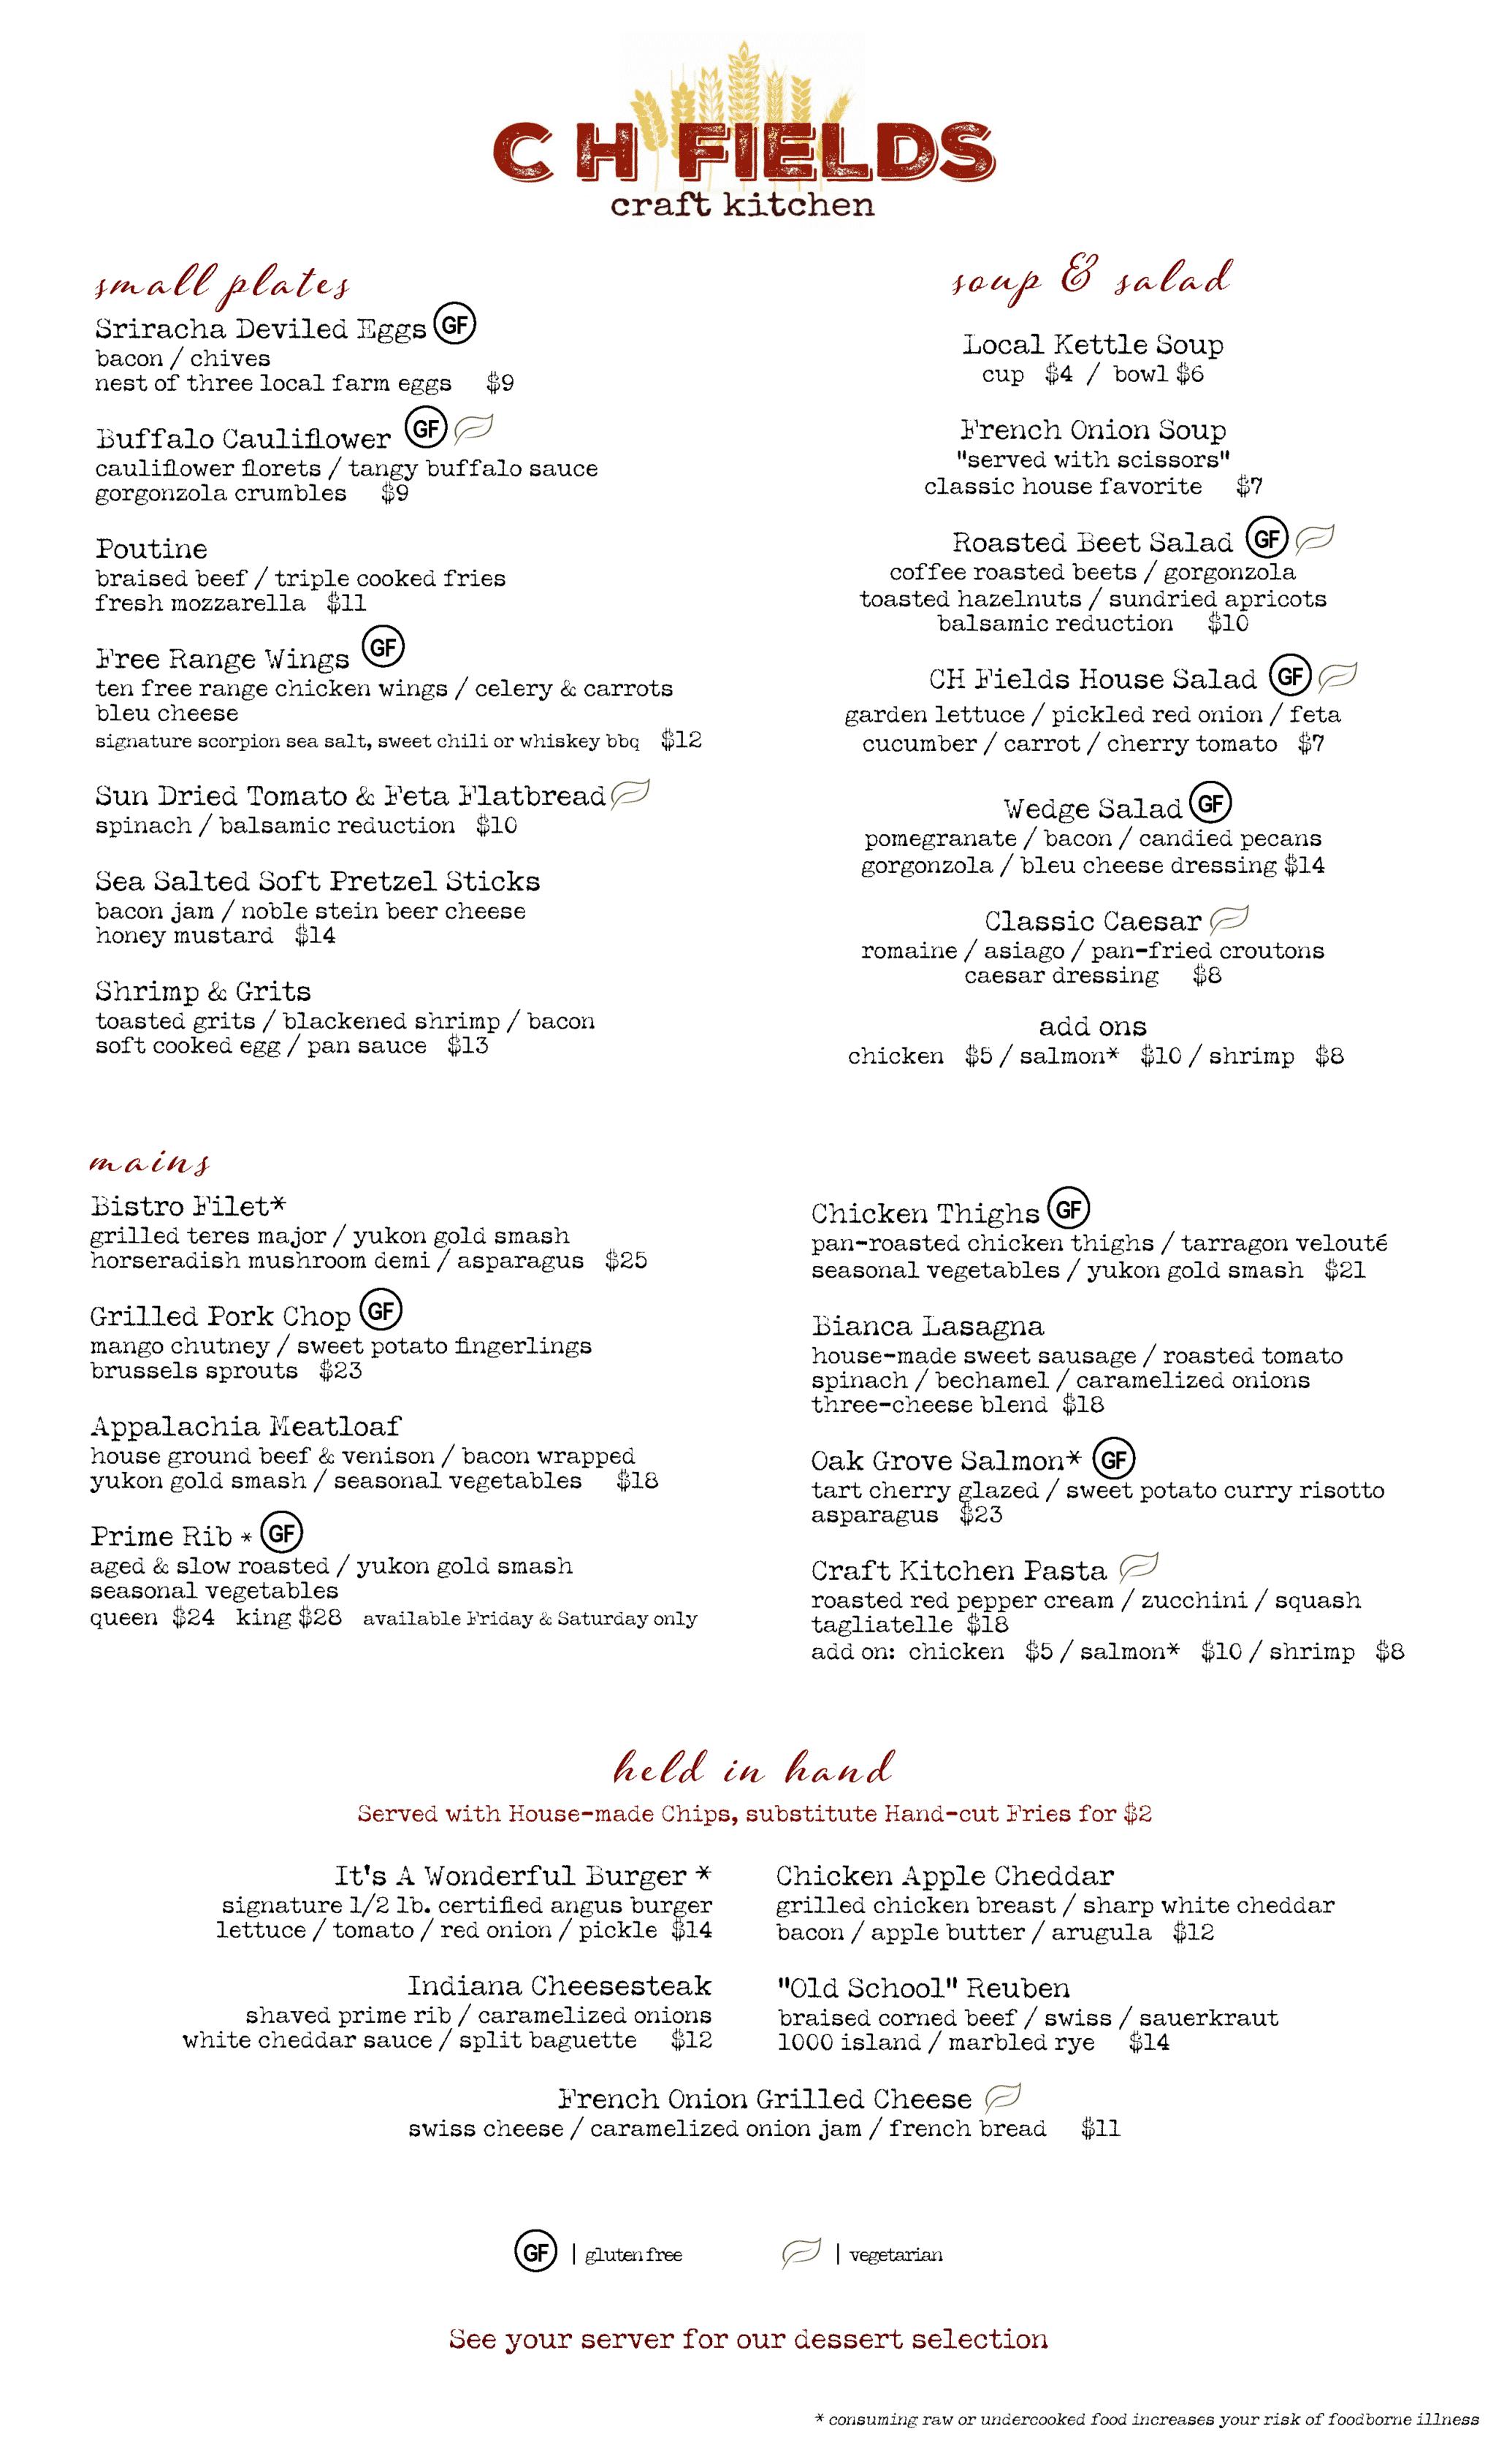 Ch Fields Fall dinner menu